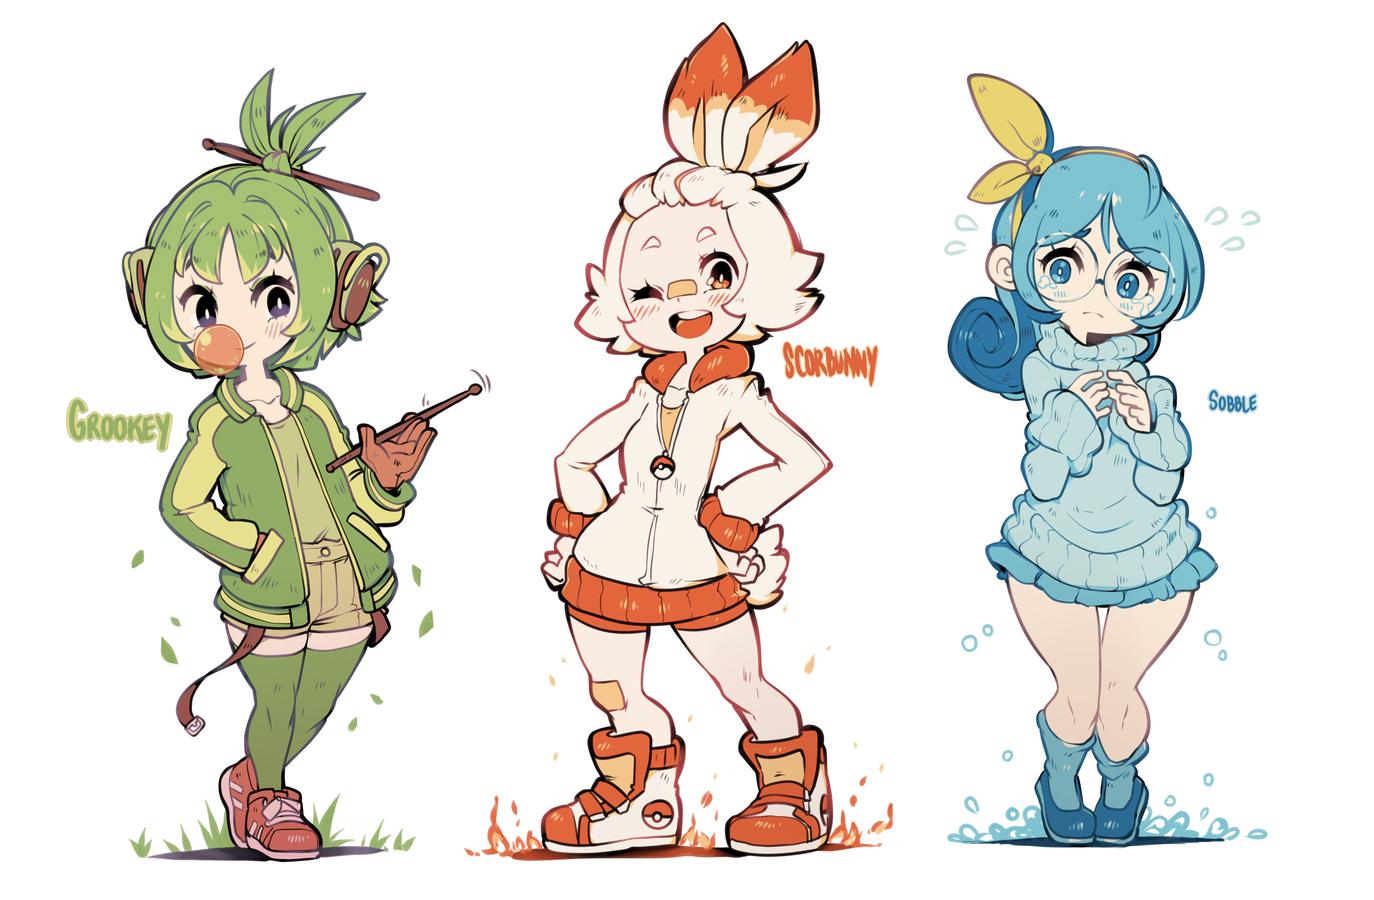 Pokemon Ss 3 Starters Gijinkas By Parororo On Deviantart